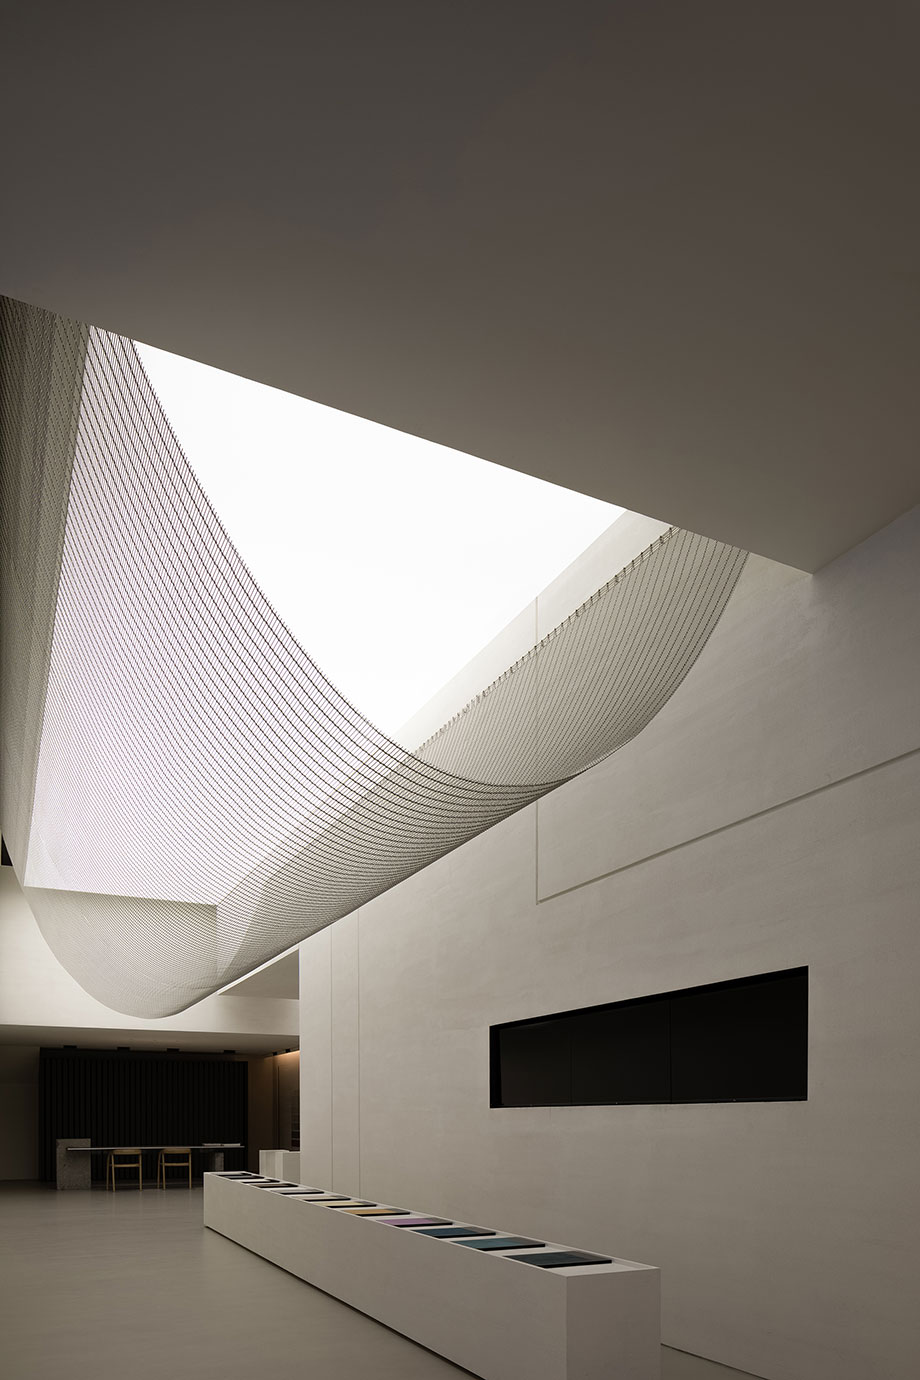 anbong home de ad architecture (12) - foto ouyang yun